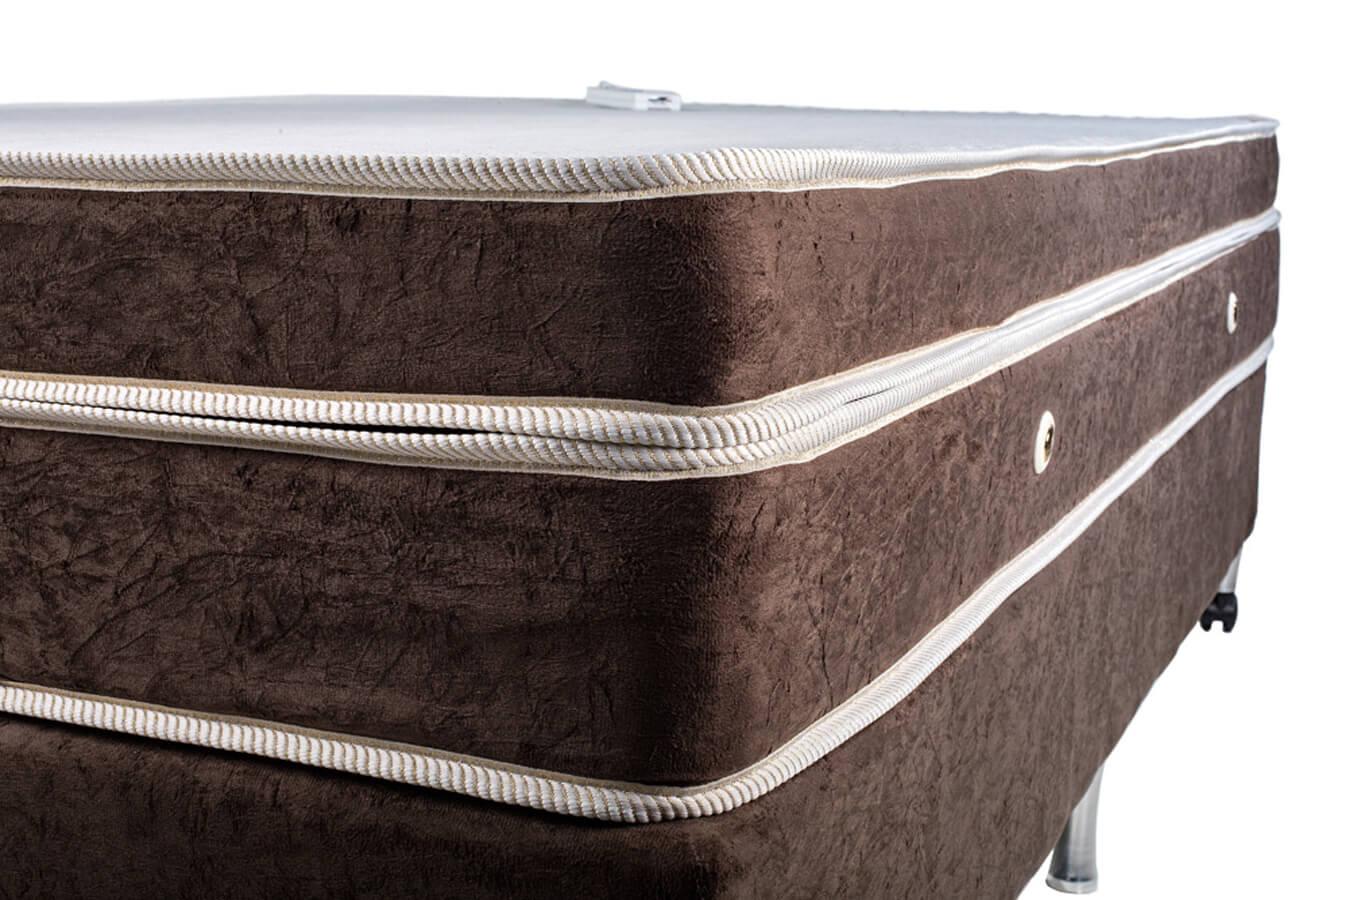 Colchão Magnético Kenko Premium Plus King Size  1,93x2,03x27cm  - Kenko Premium Colchões